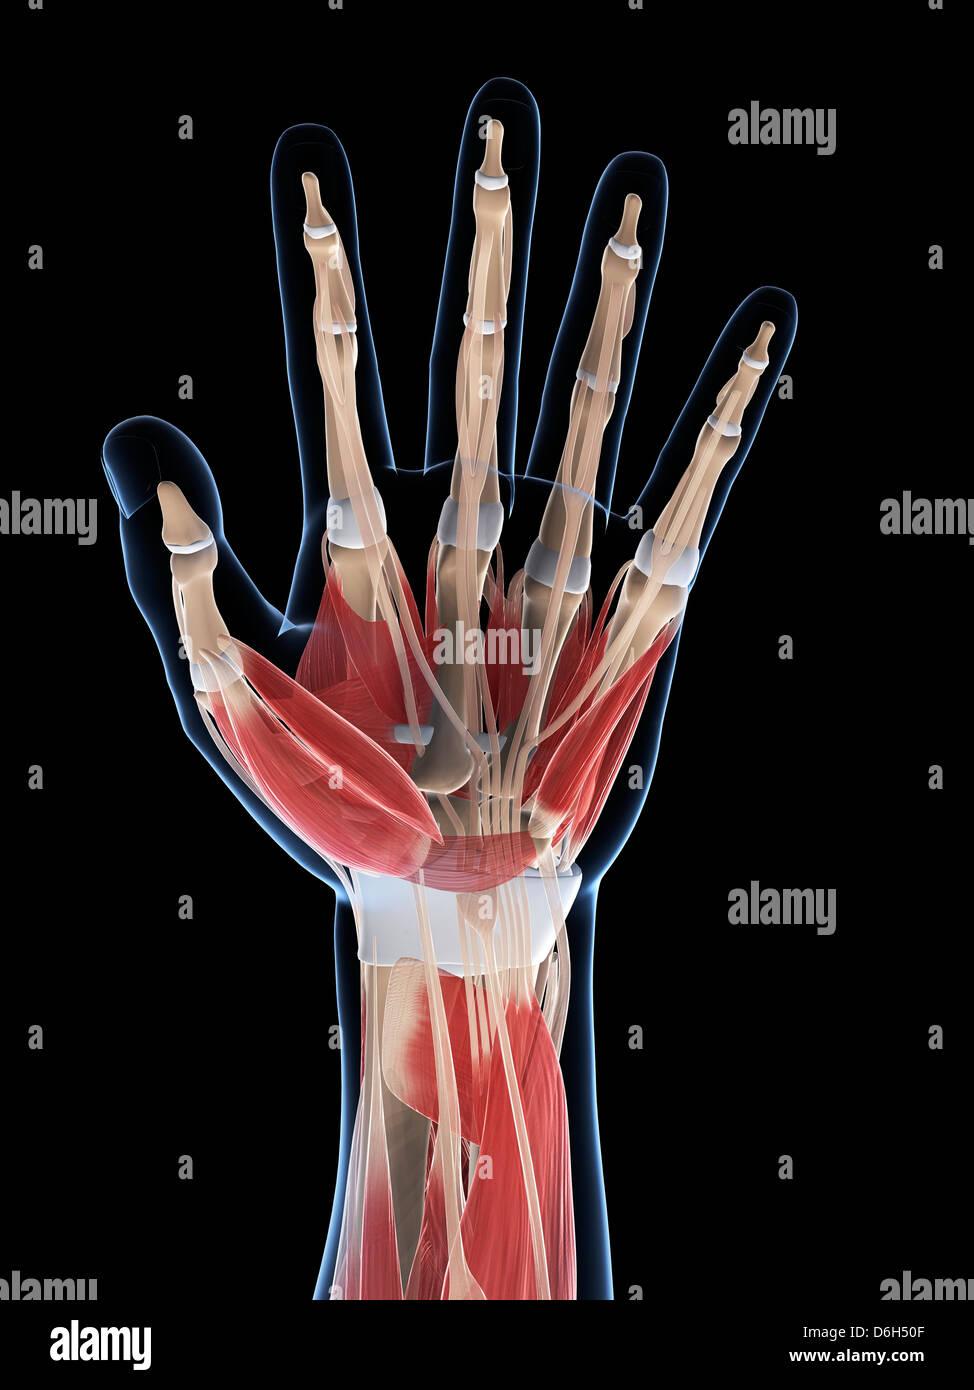 Hand Anatomy Artwork Tendon Stock Photos Hand Anatomy Artwork